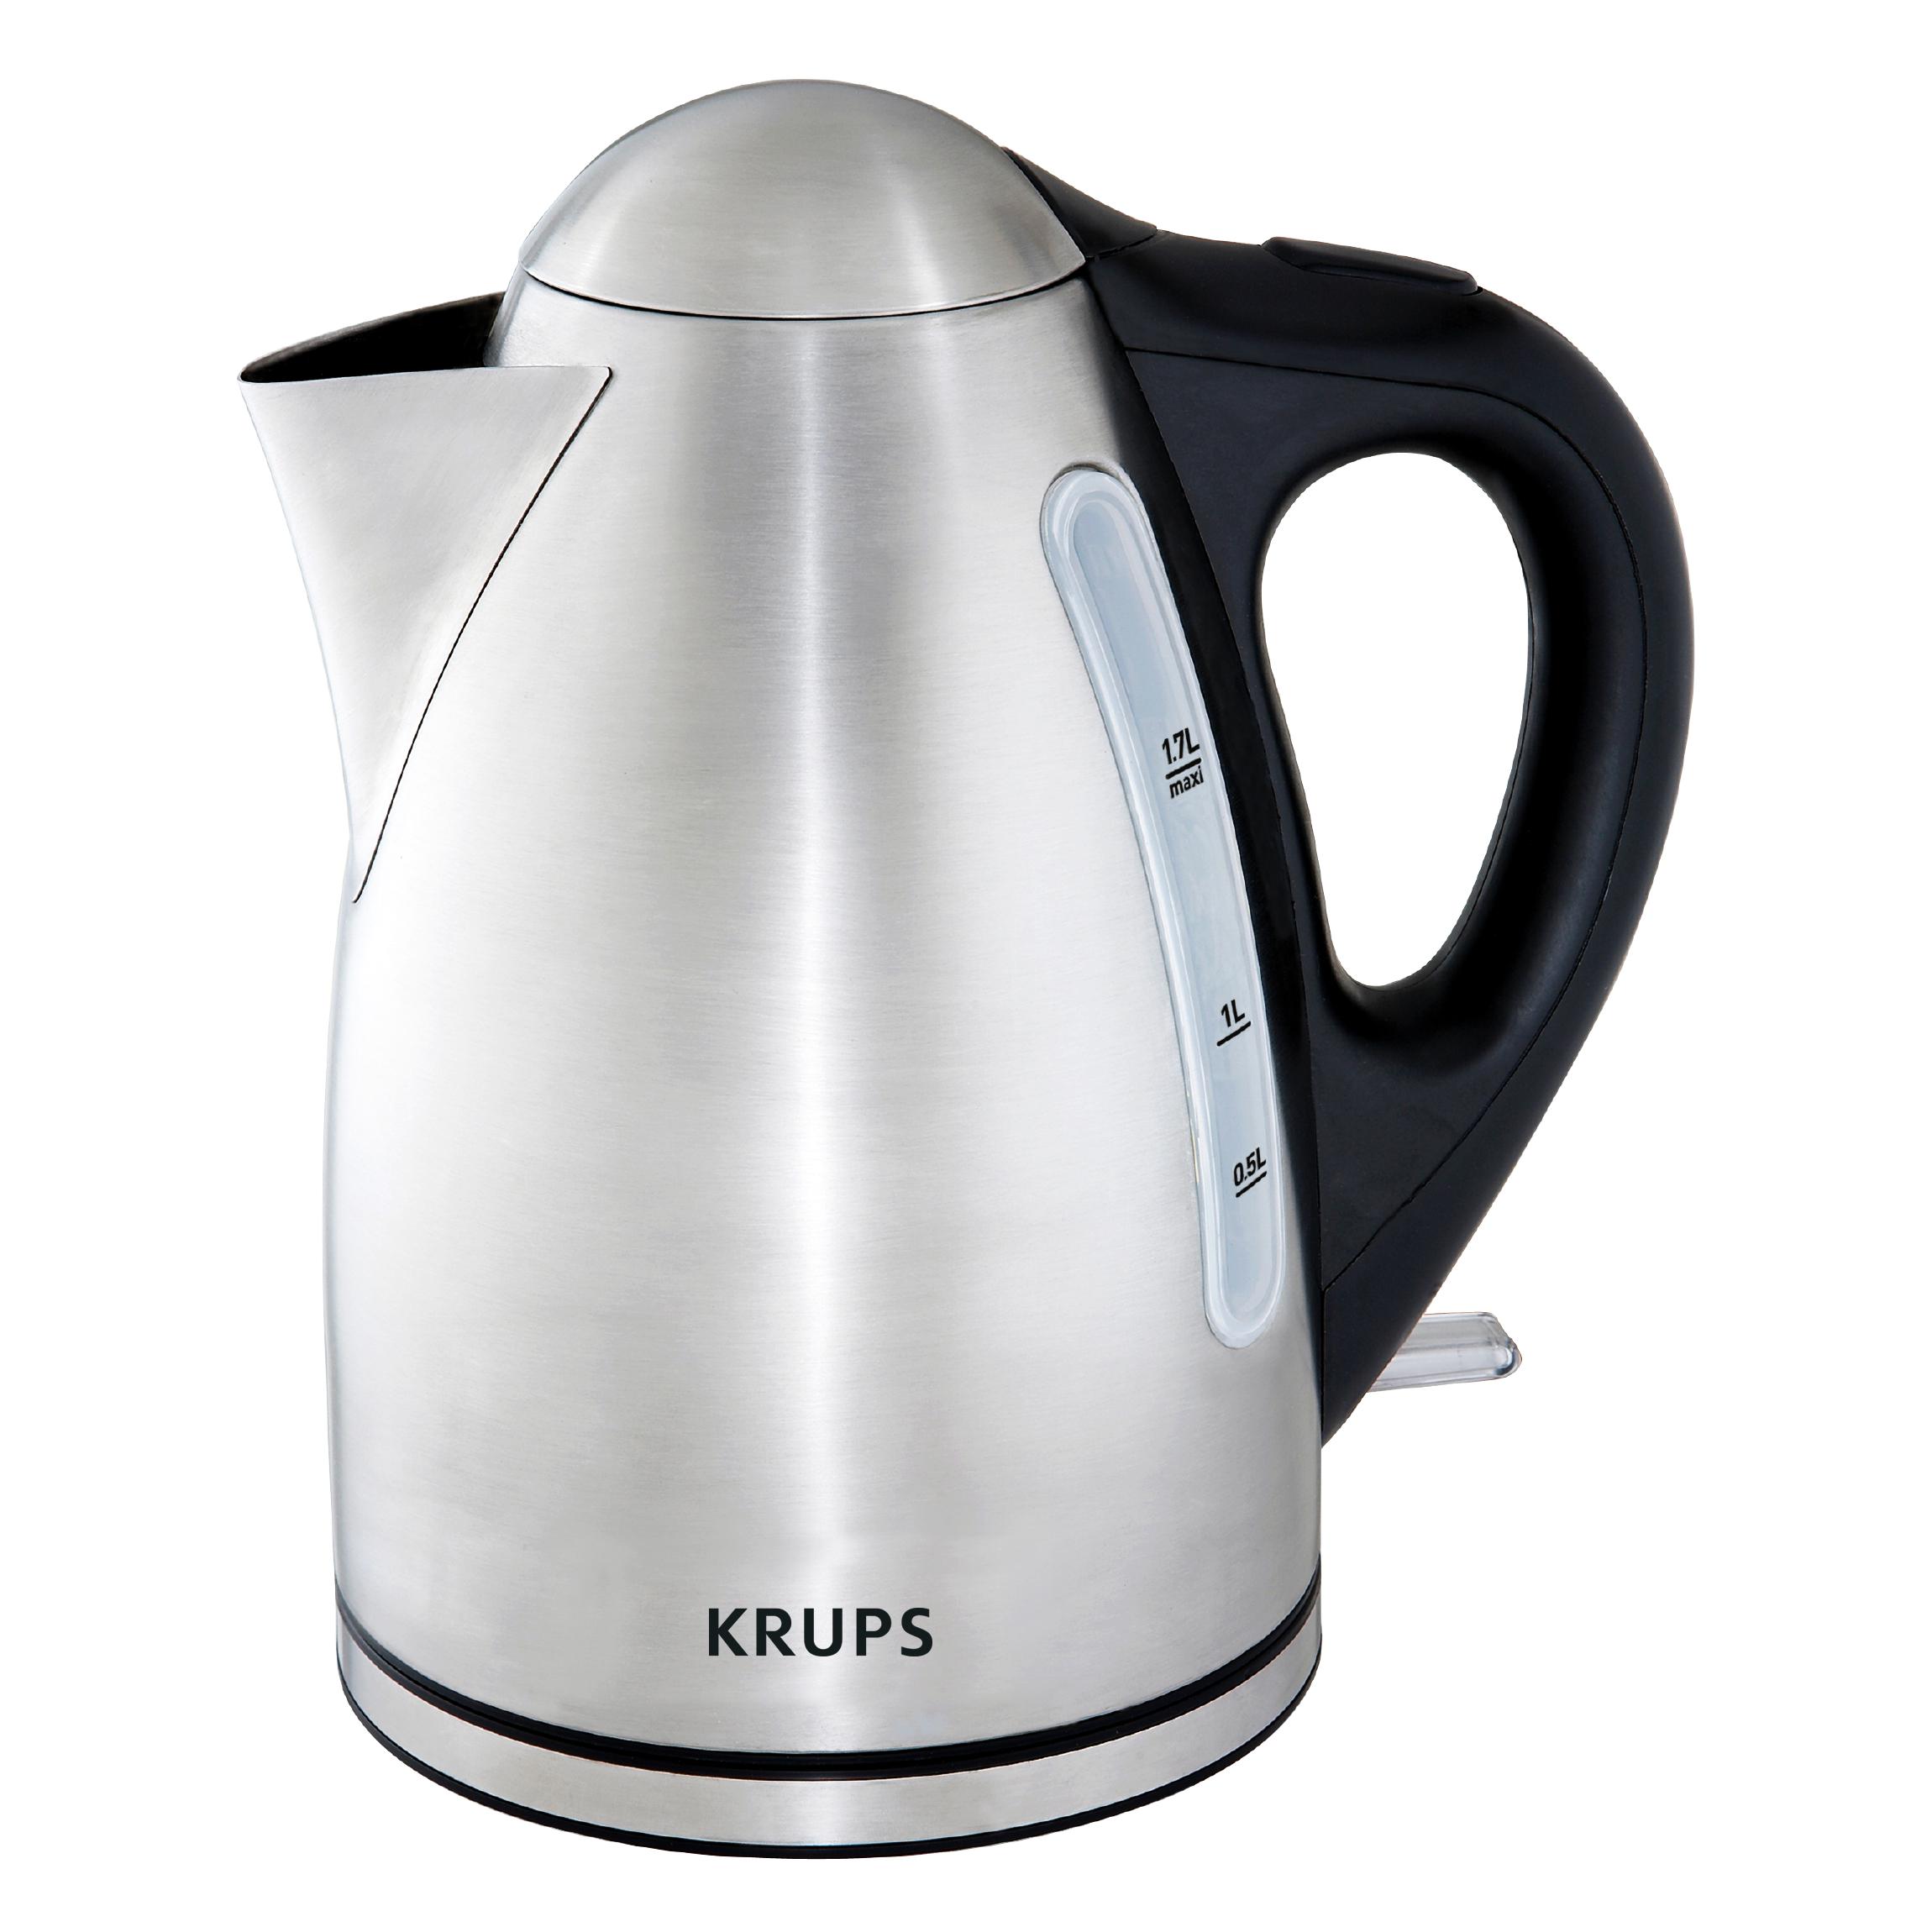 Krups Performa Stainless Steel 1.7 Liter Kettle